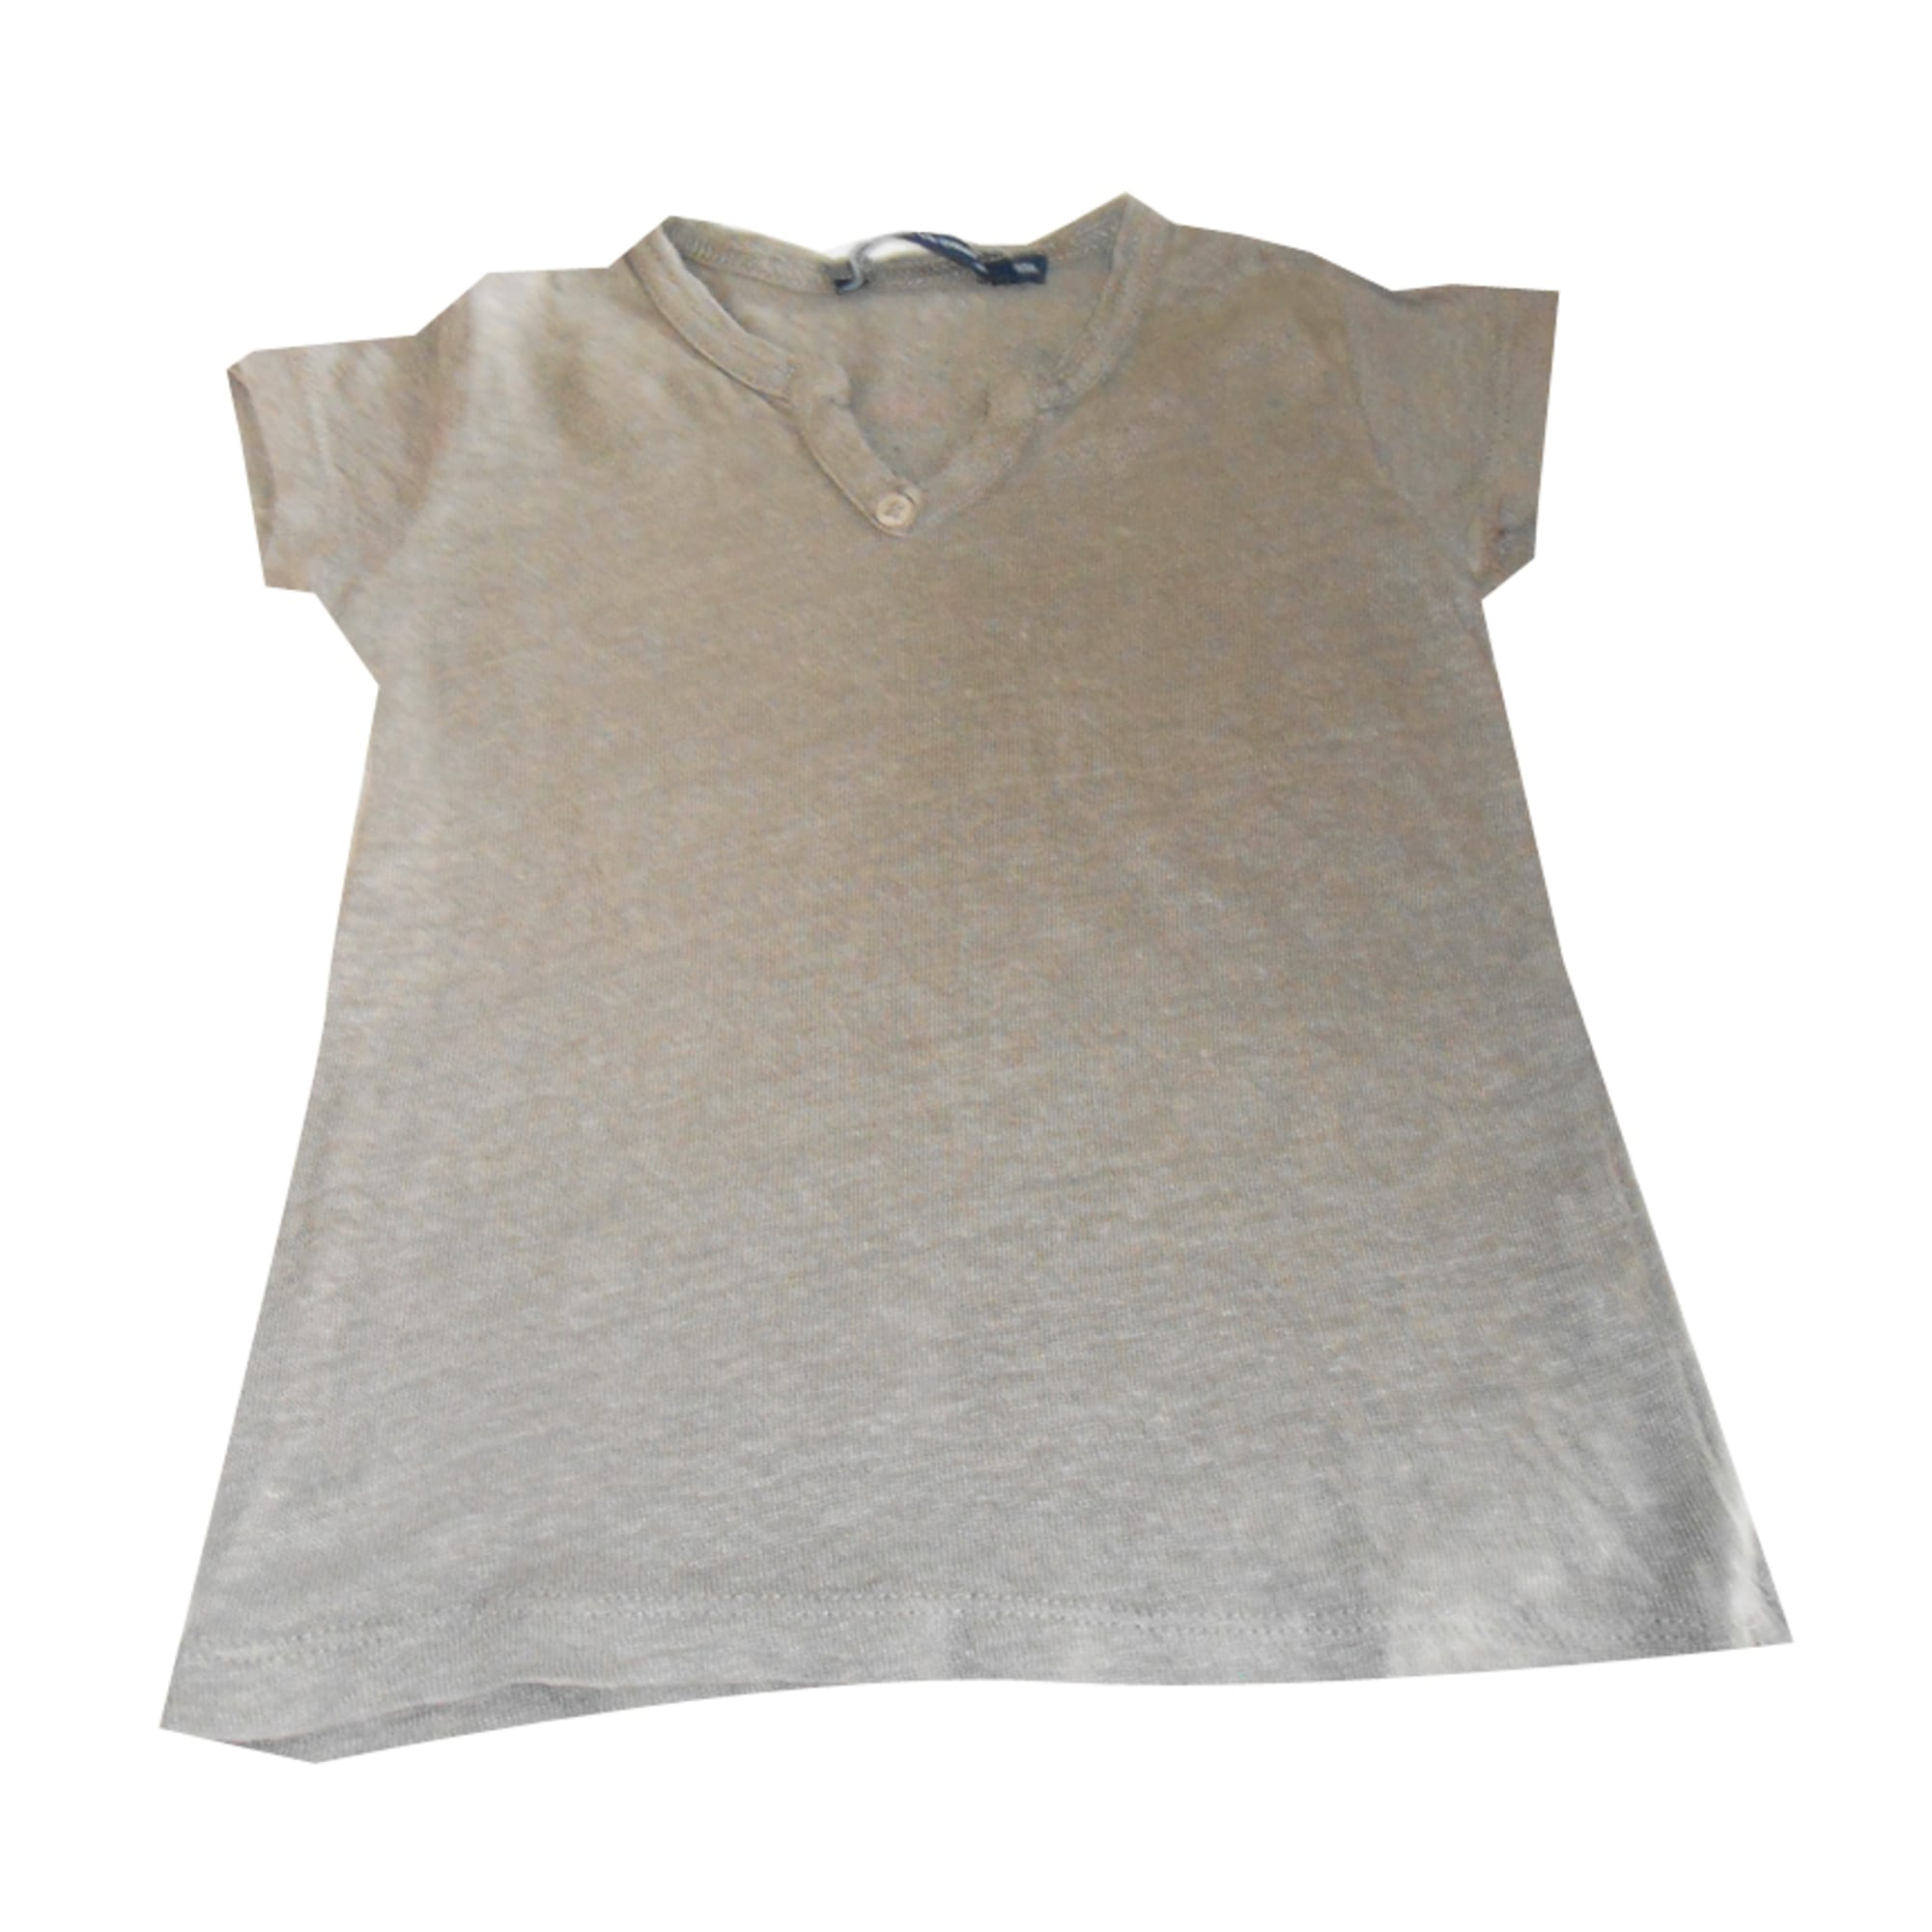 Top, tee shirt LE PHARE DE LA BALEINE Beige, camel